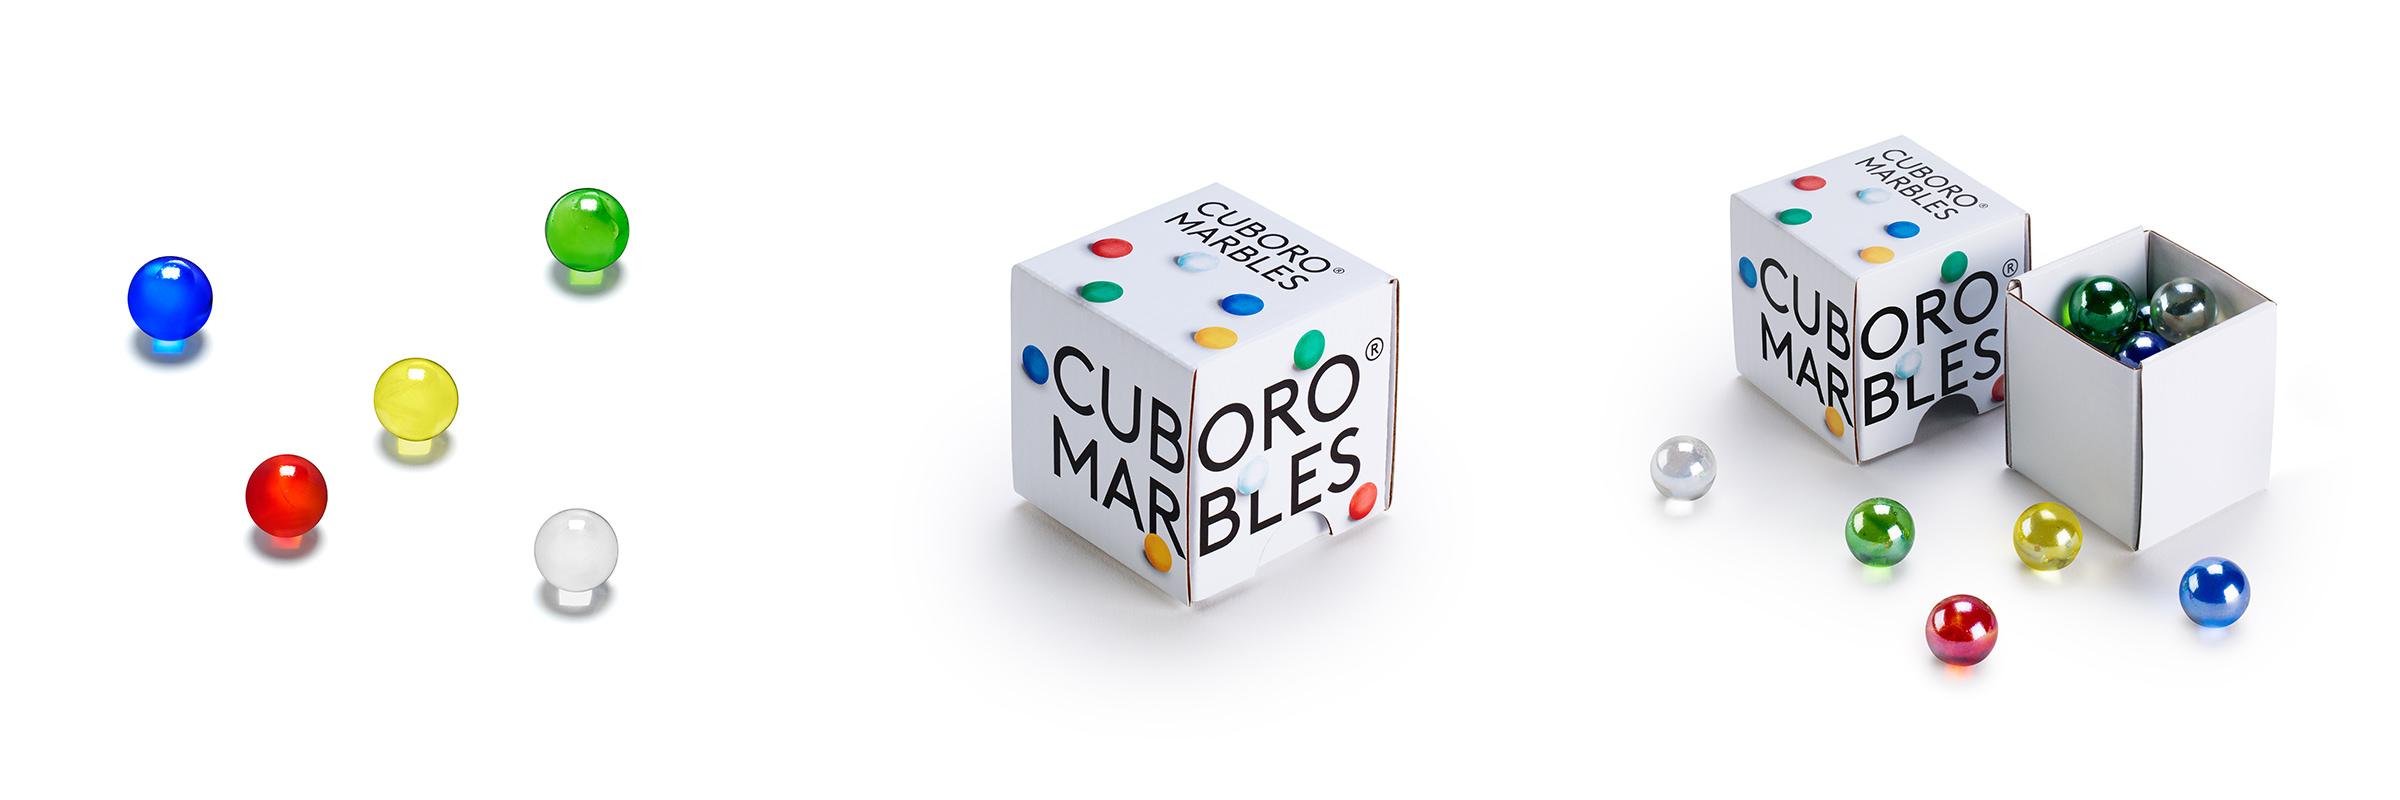 CUBORO Marbles Kugelbahn